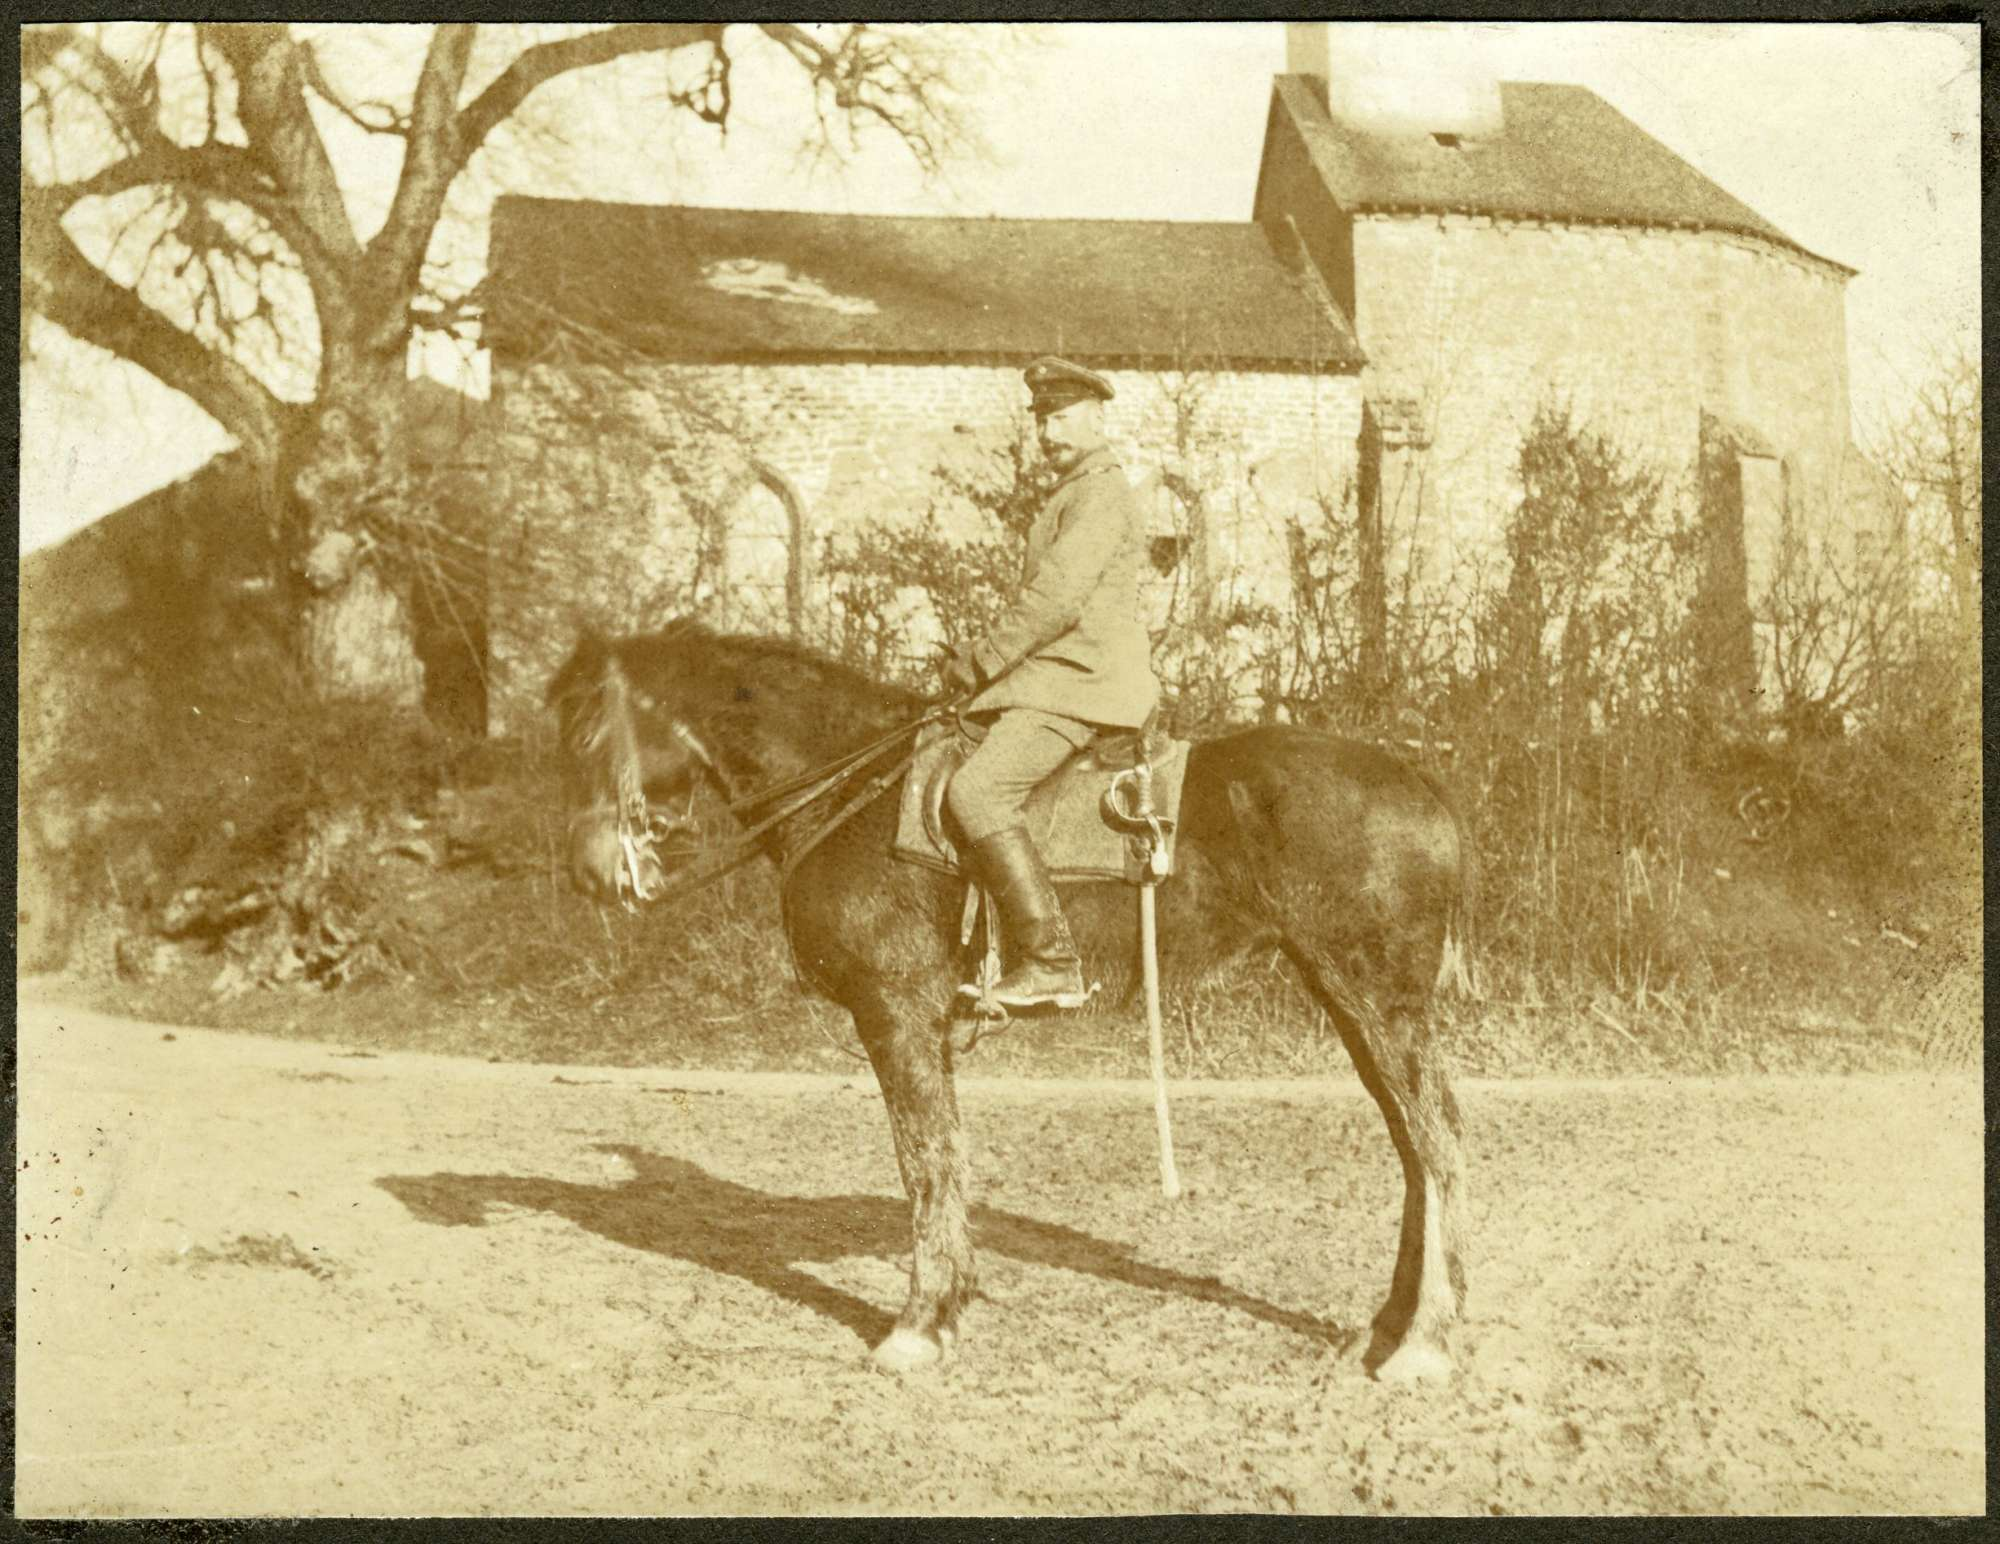 Haug, Eberhard, Bild 1